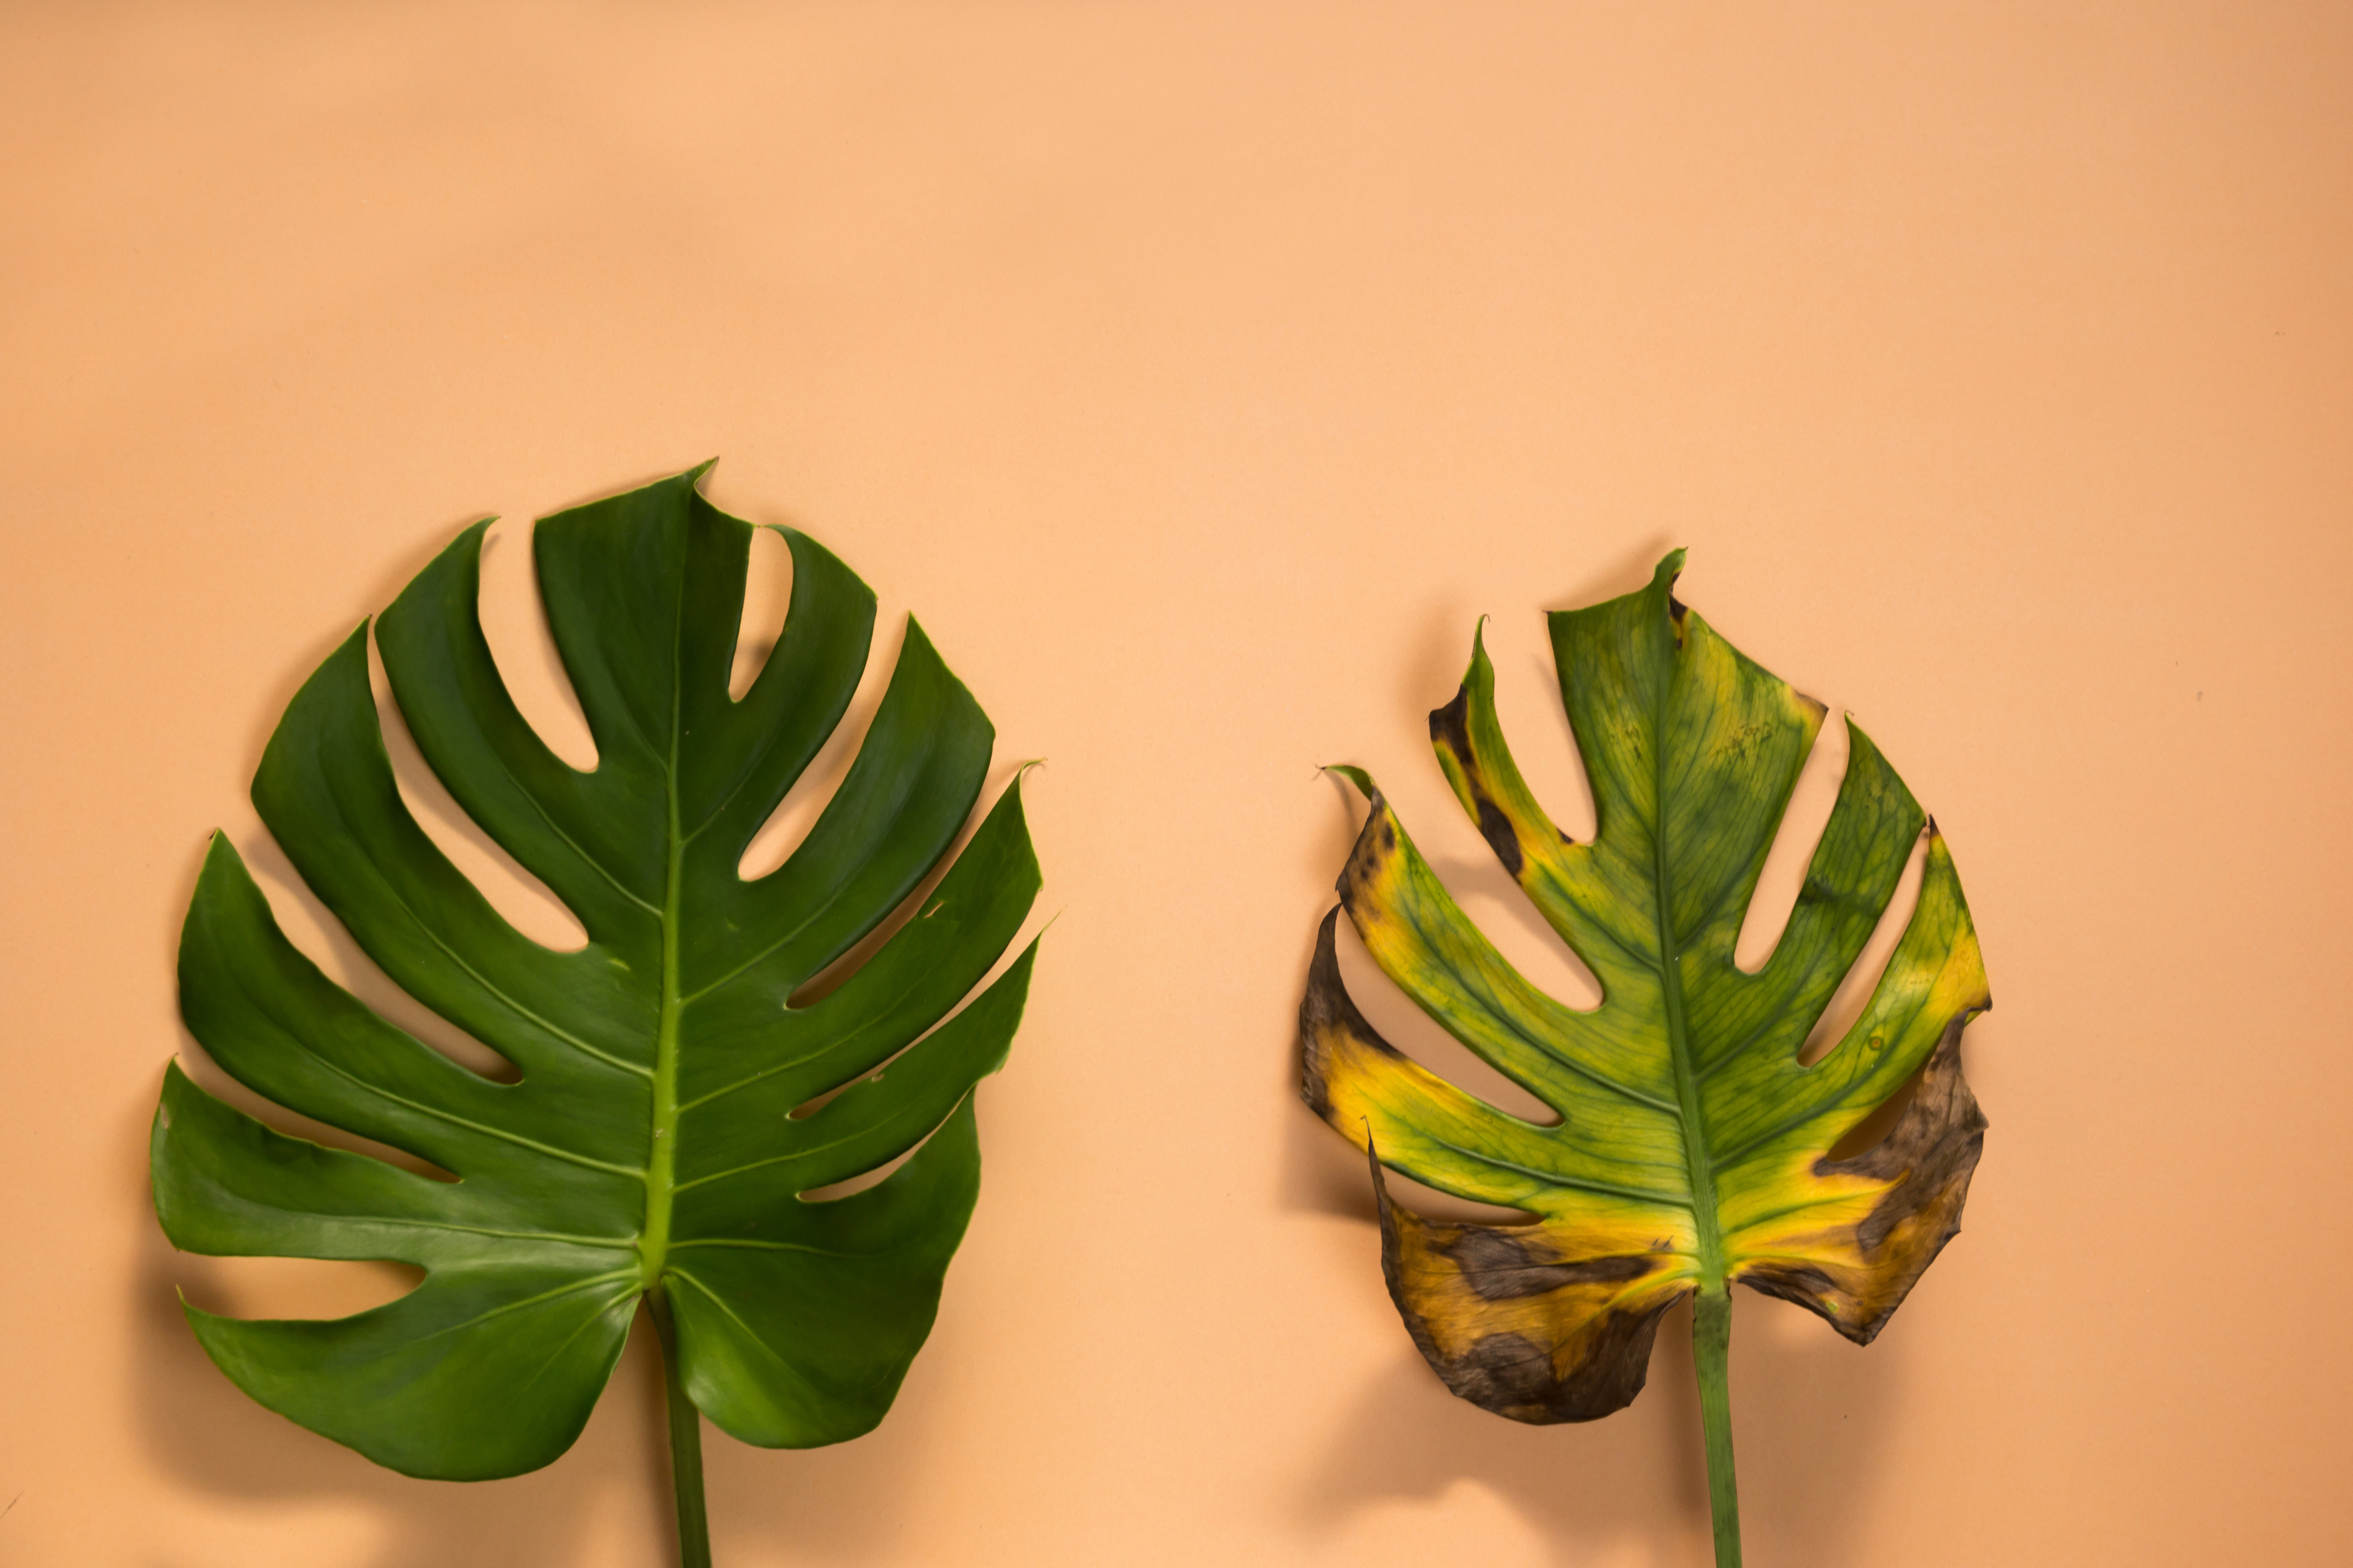 malattie-piante-foglie1